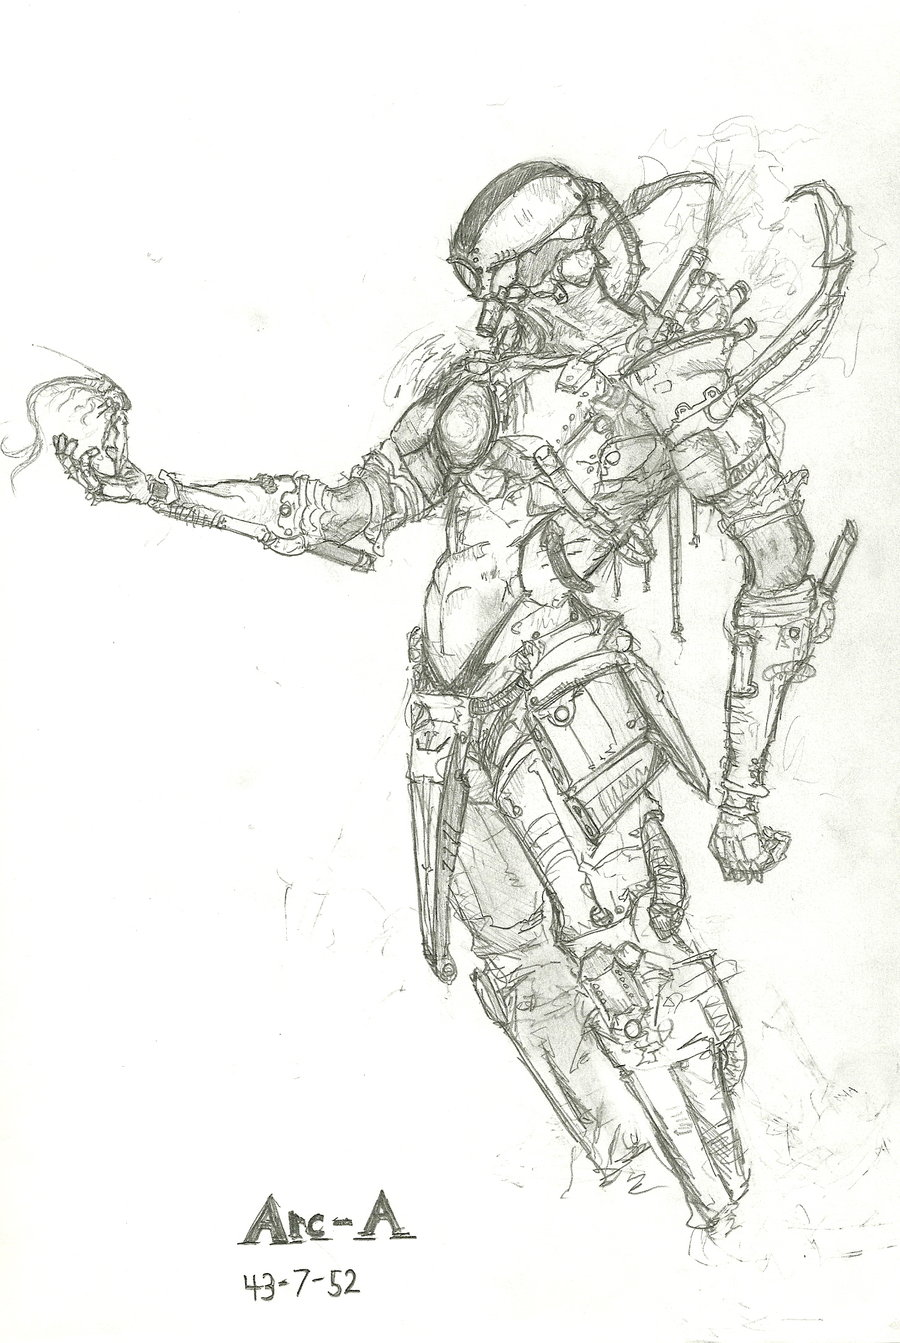 arc angel by robot drawing club on deviantart